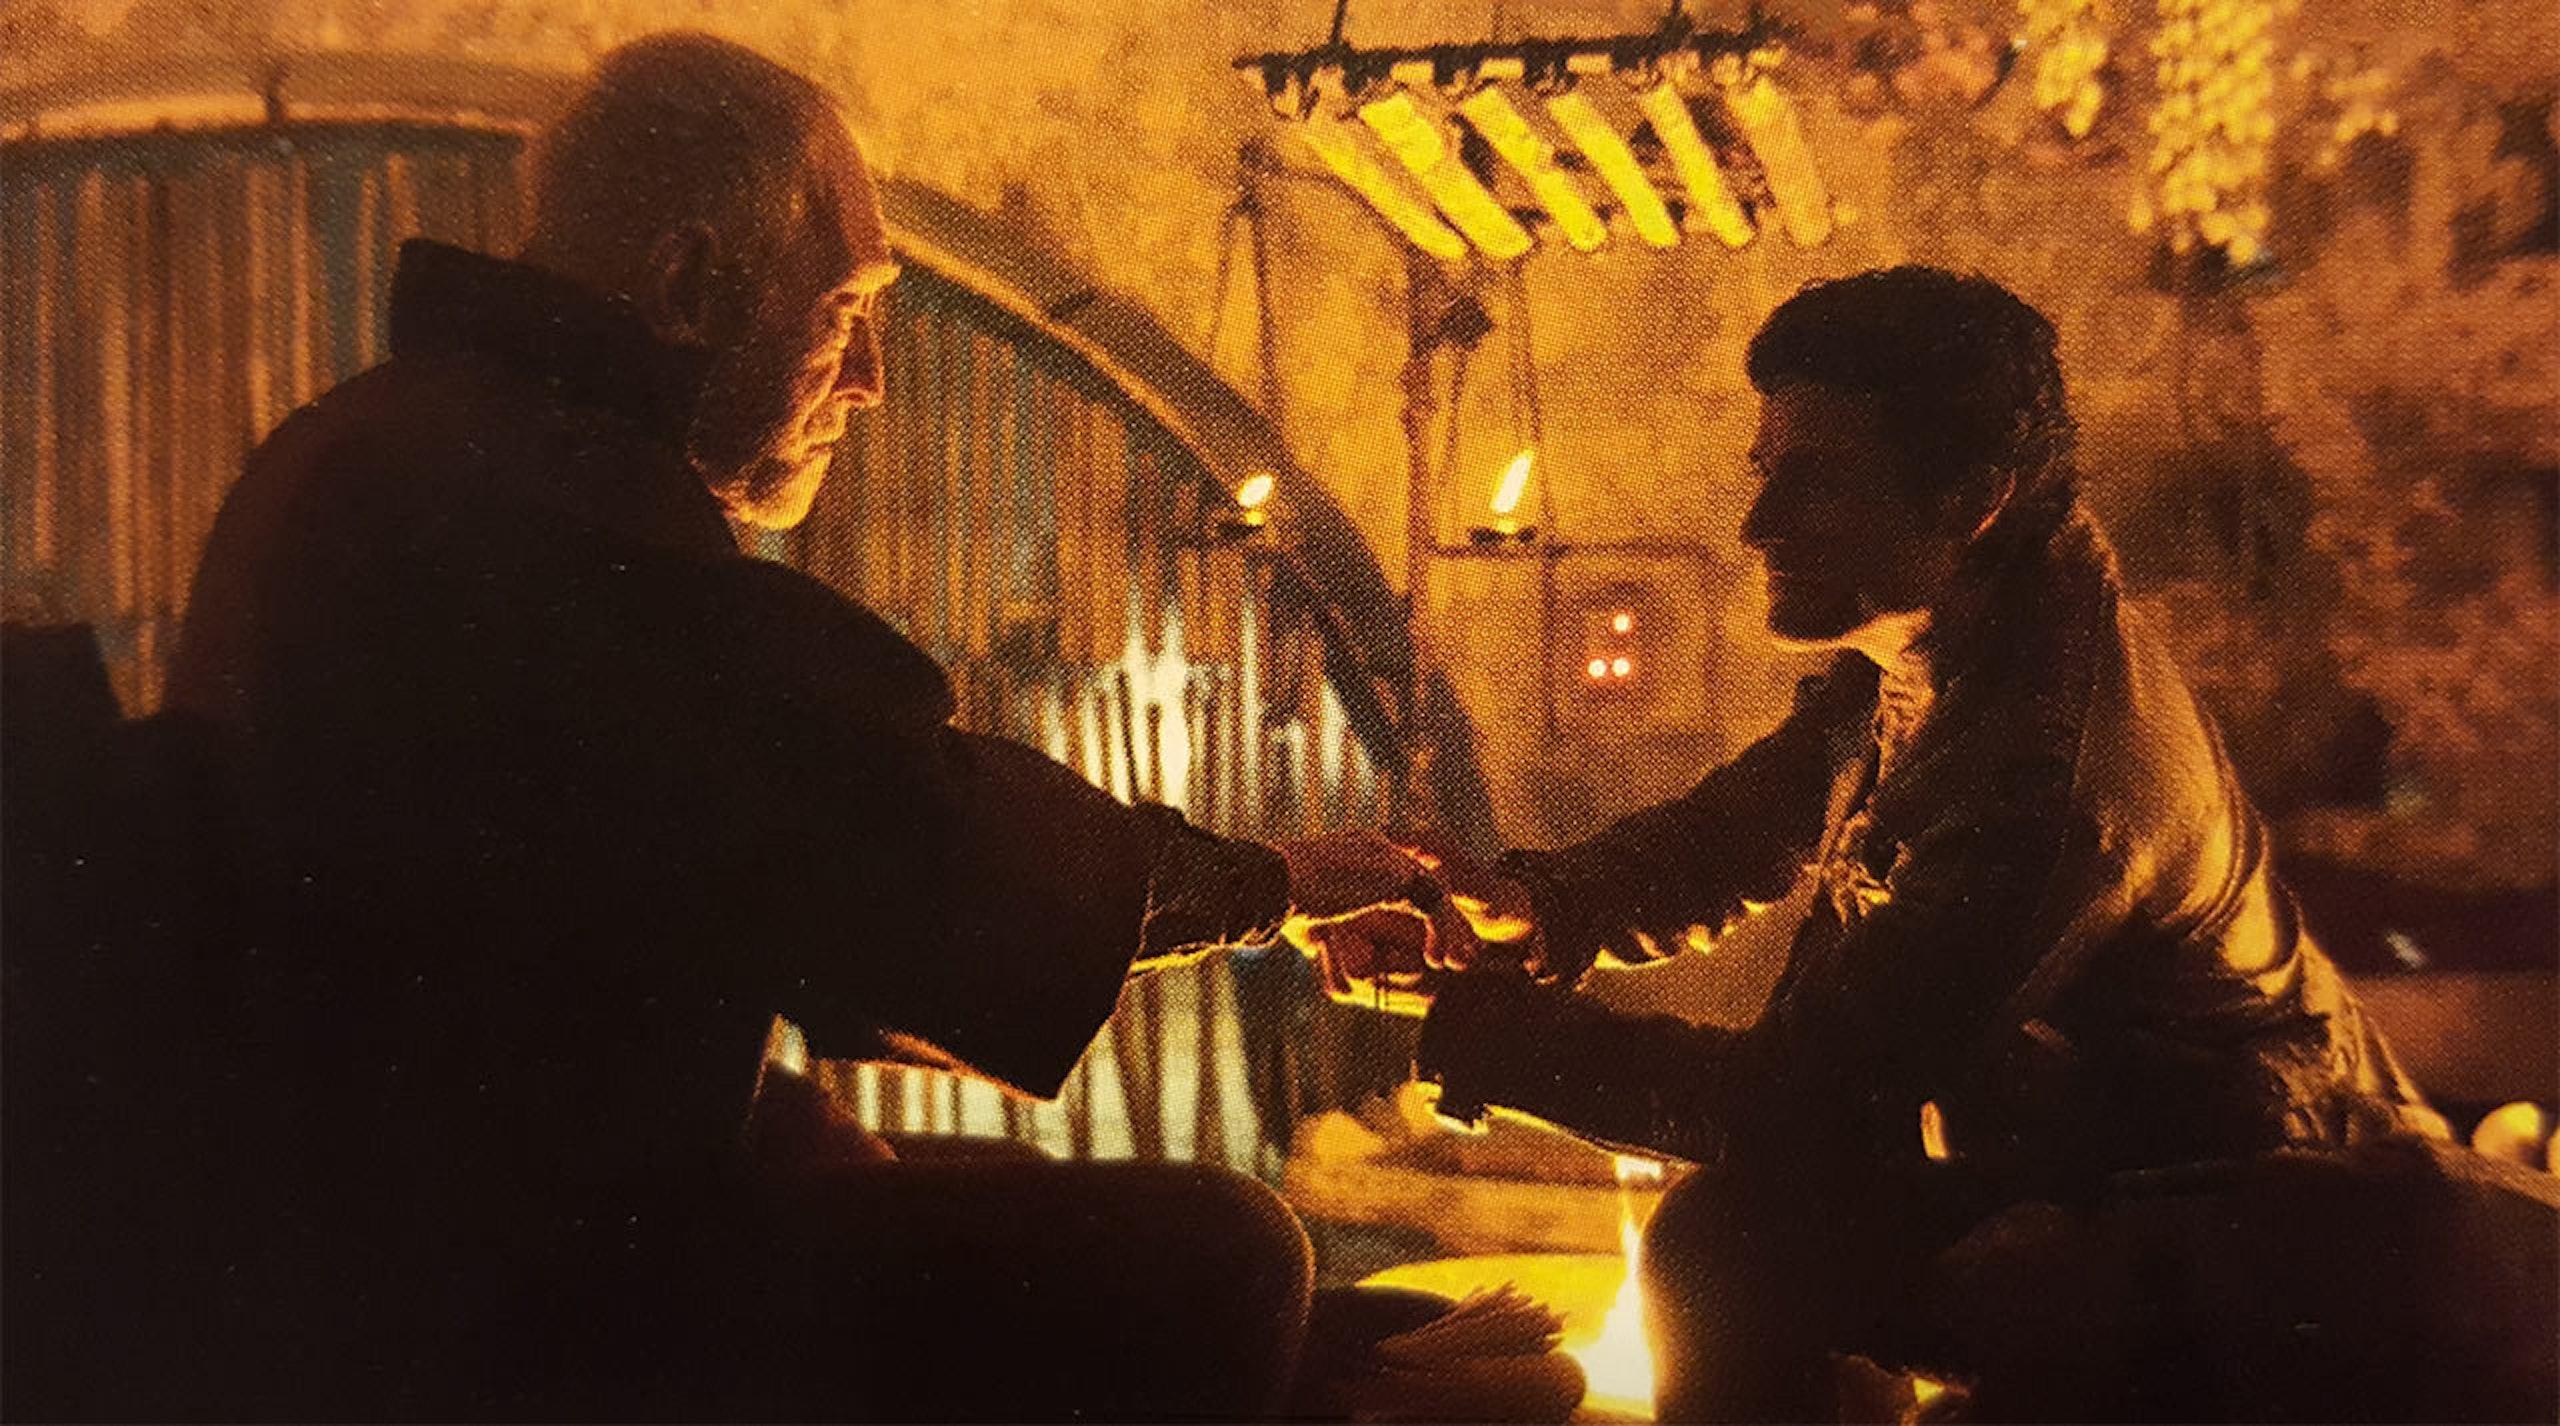 Lor San Tekka with Poe Dameron in 'The Force Awakens'